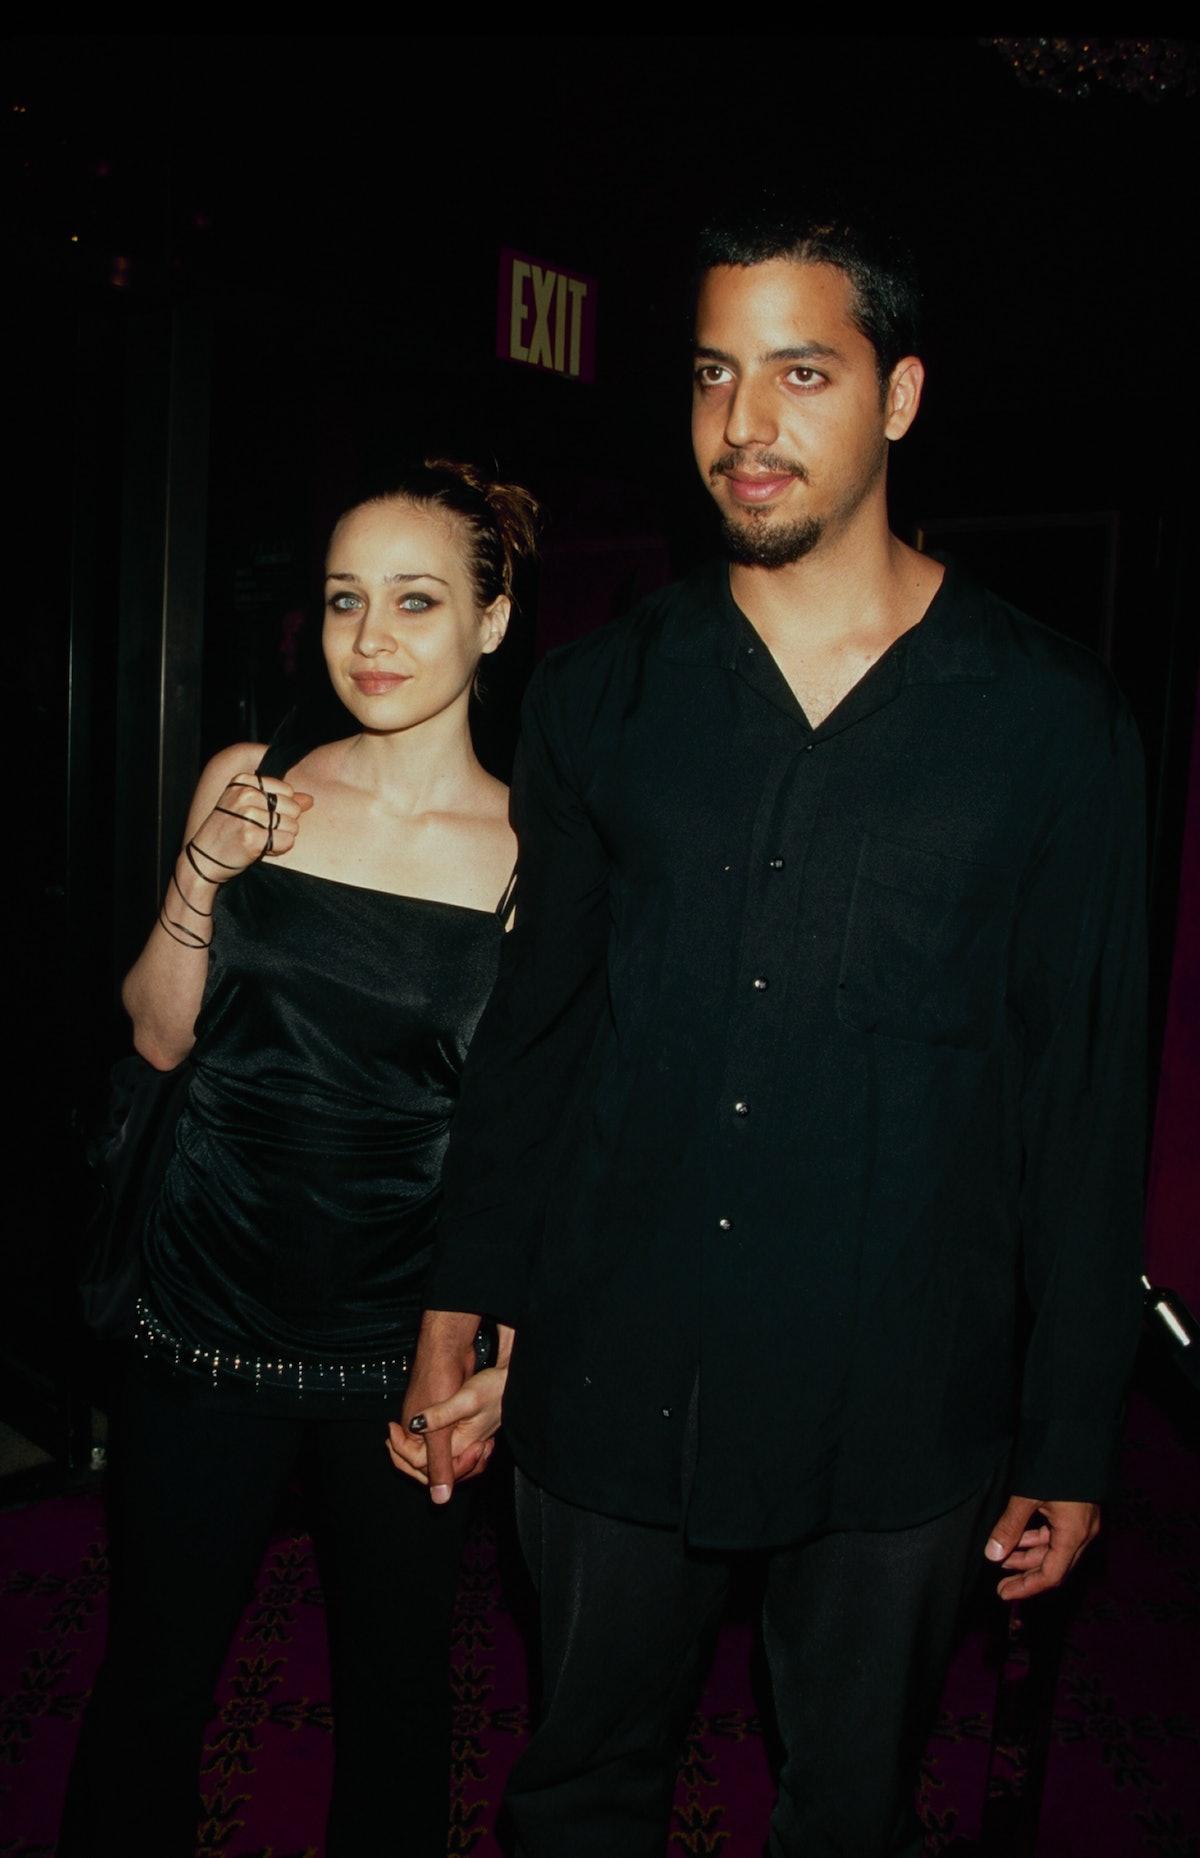 Fiona Apple and David Blaine